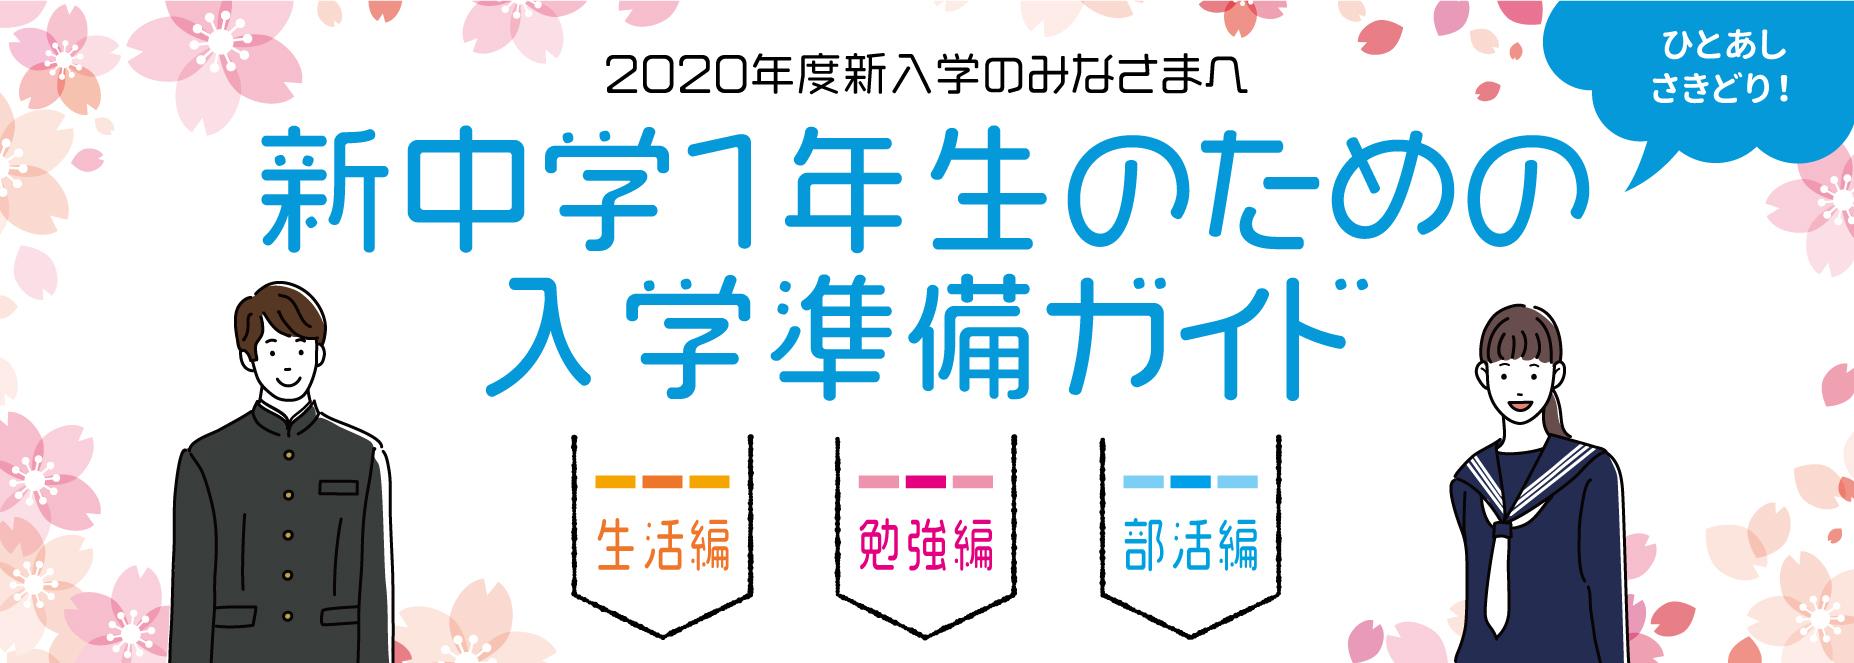 shinnyuugaku2020_bnr.jpg